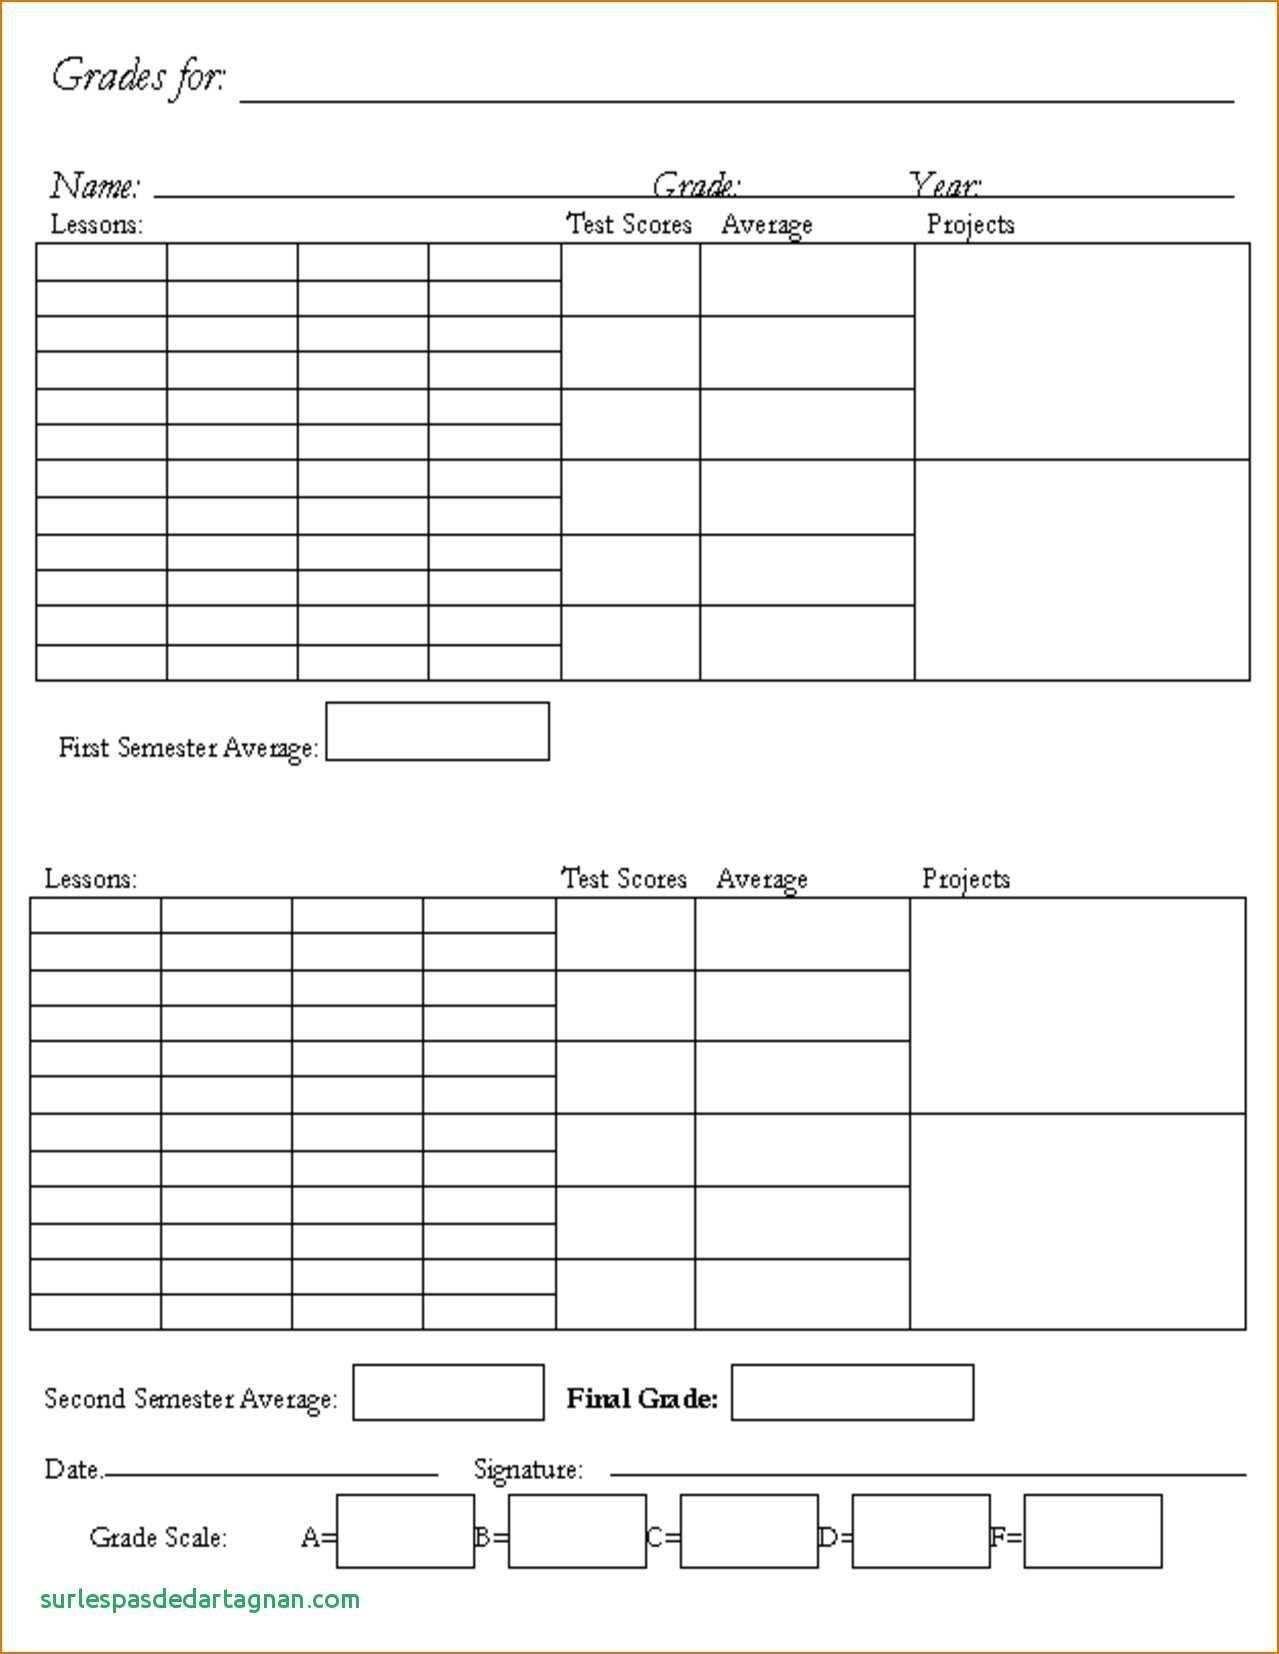 000 Dreaded Middle School Report Card Template High Definition  Pdf Homeschool Free Standard Based SampleFull